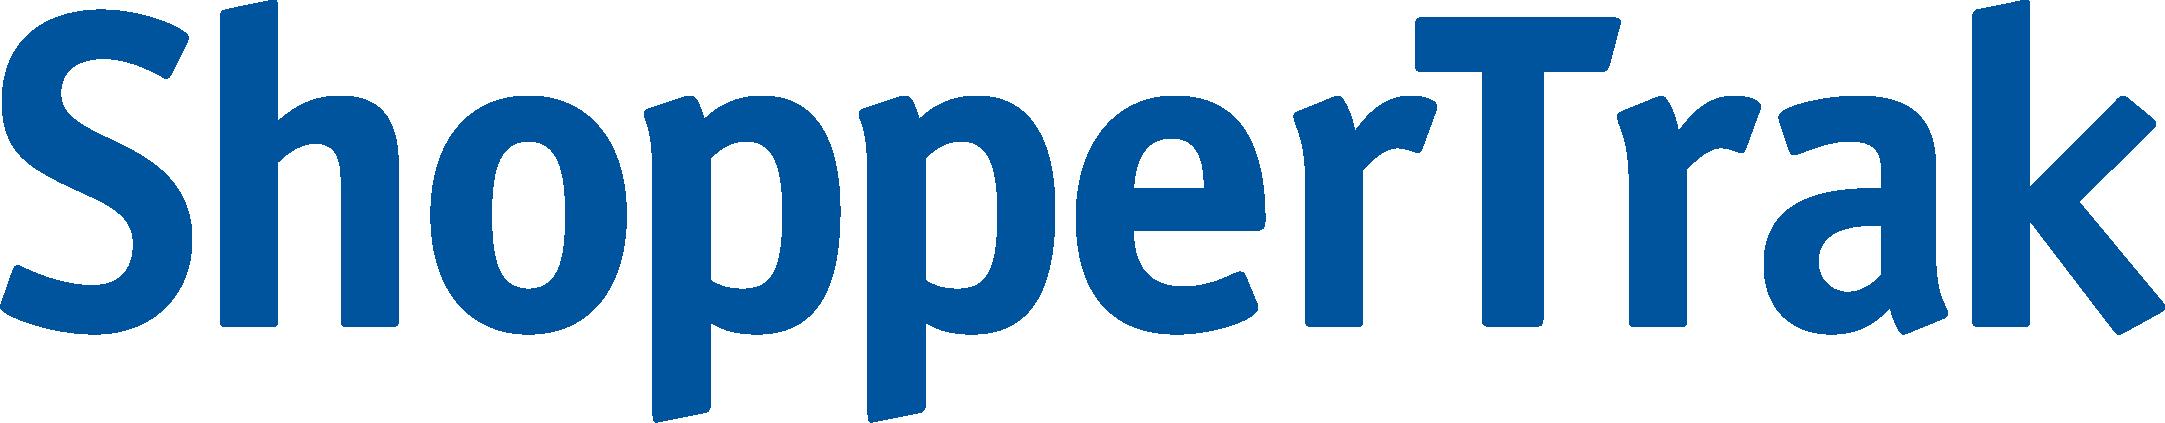 ShopperTrack